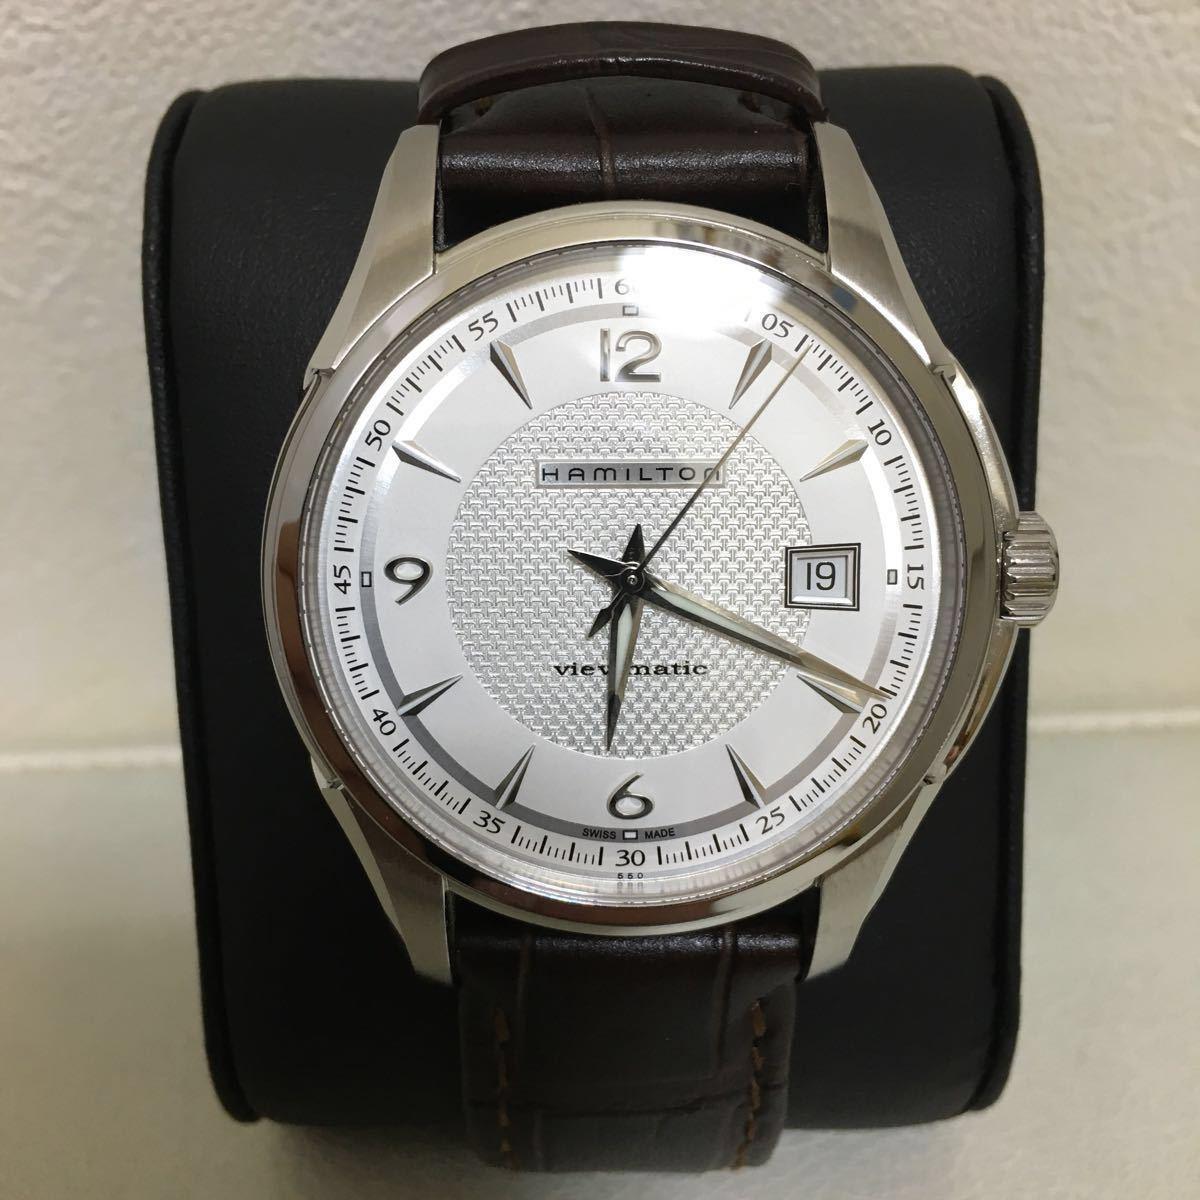 sale retailer d24b7 eed46 ハミルトン 腕時計 ジャズマスターの値段と価格推移は?|115件 ...